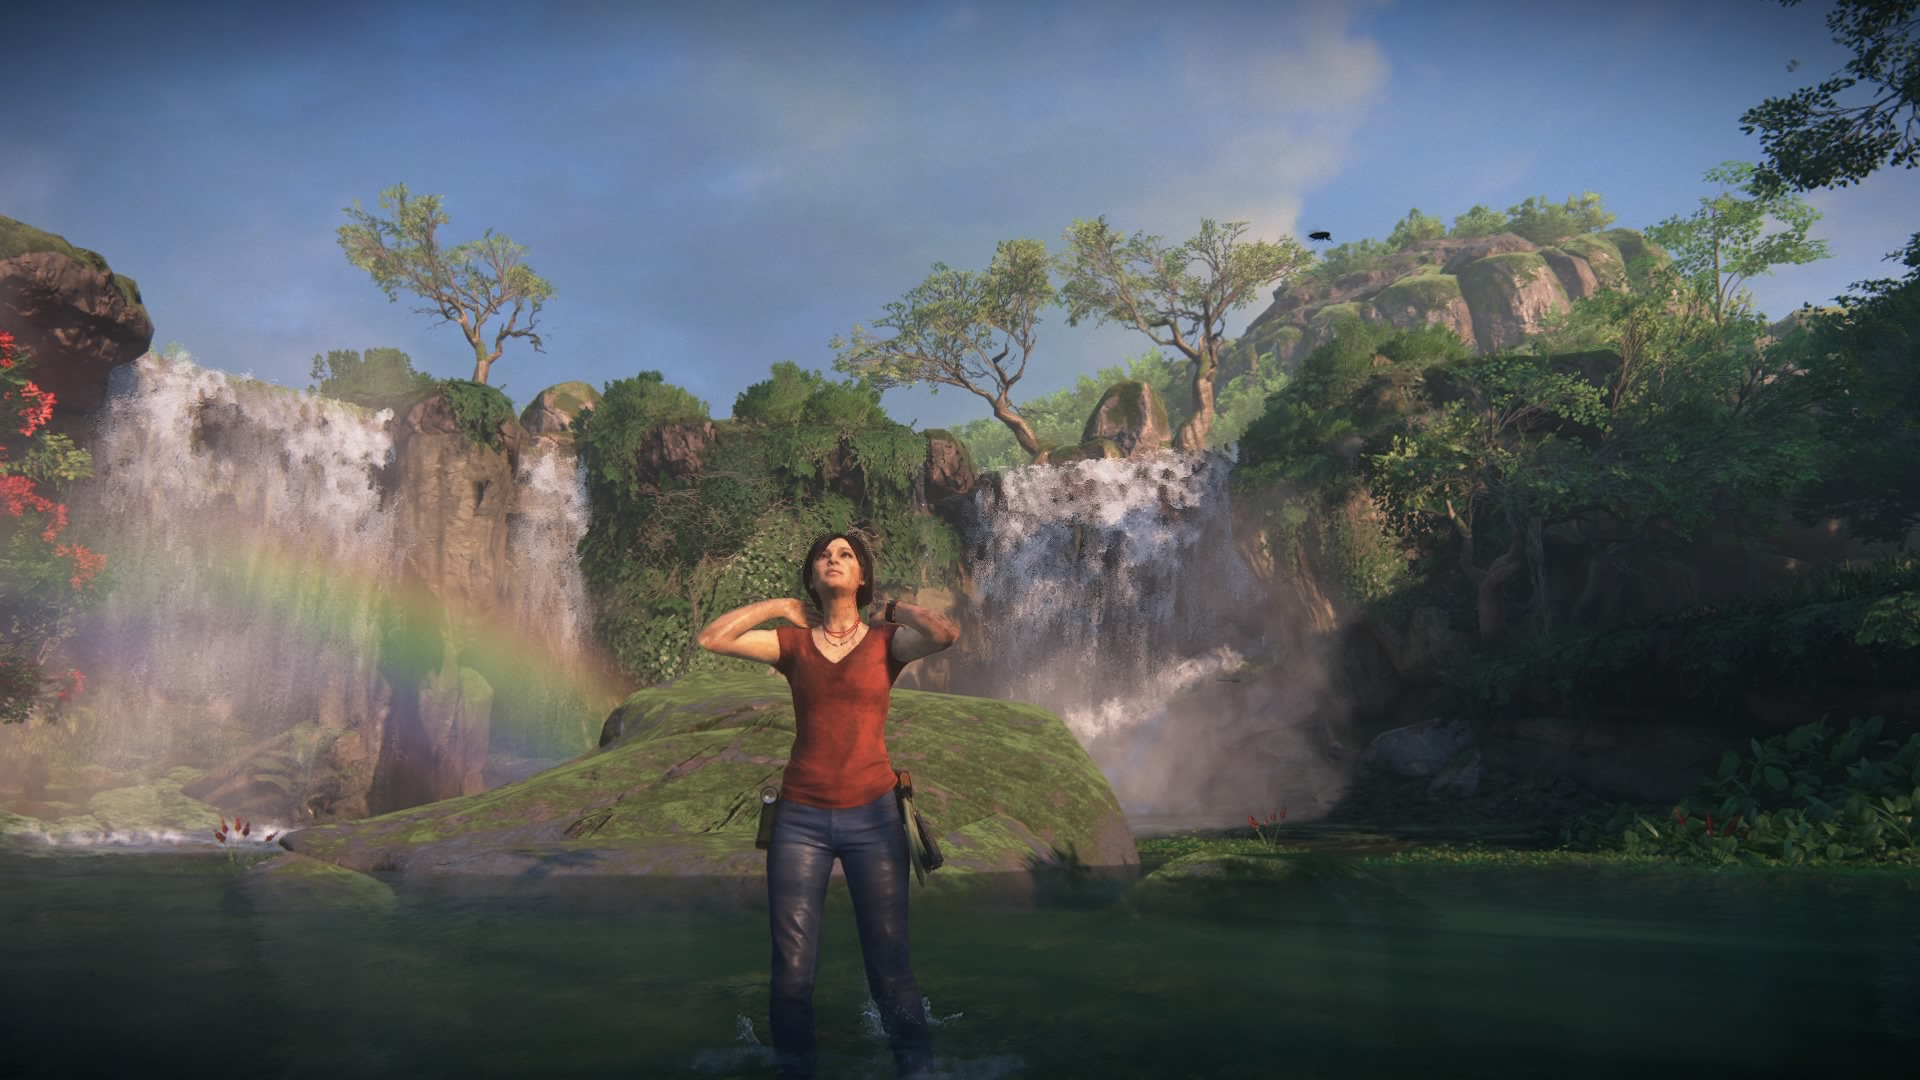 Chloe enjoying the weather. Rainbow in the background.